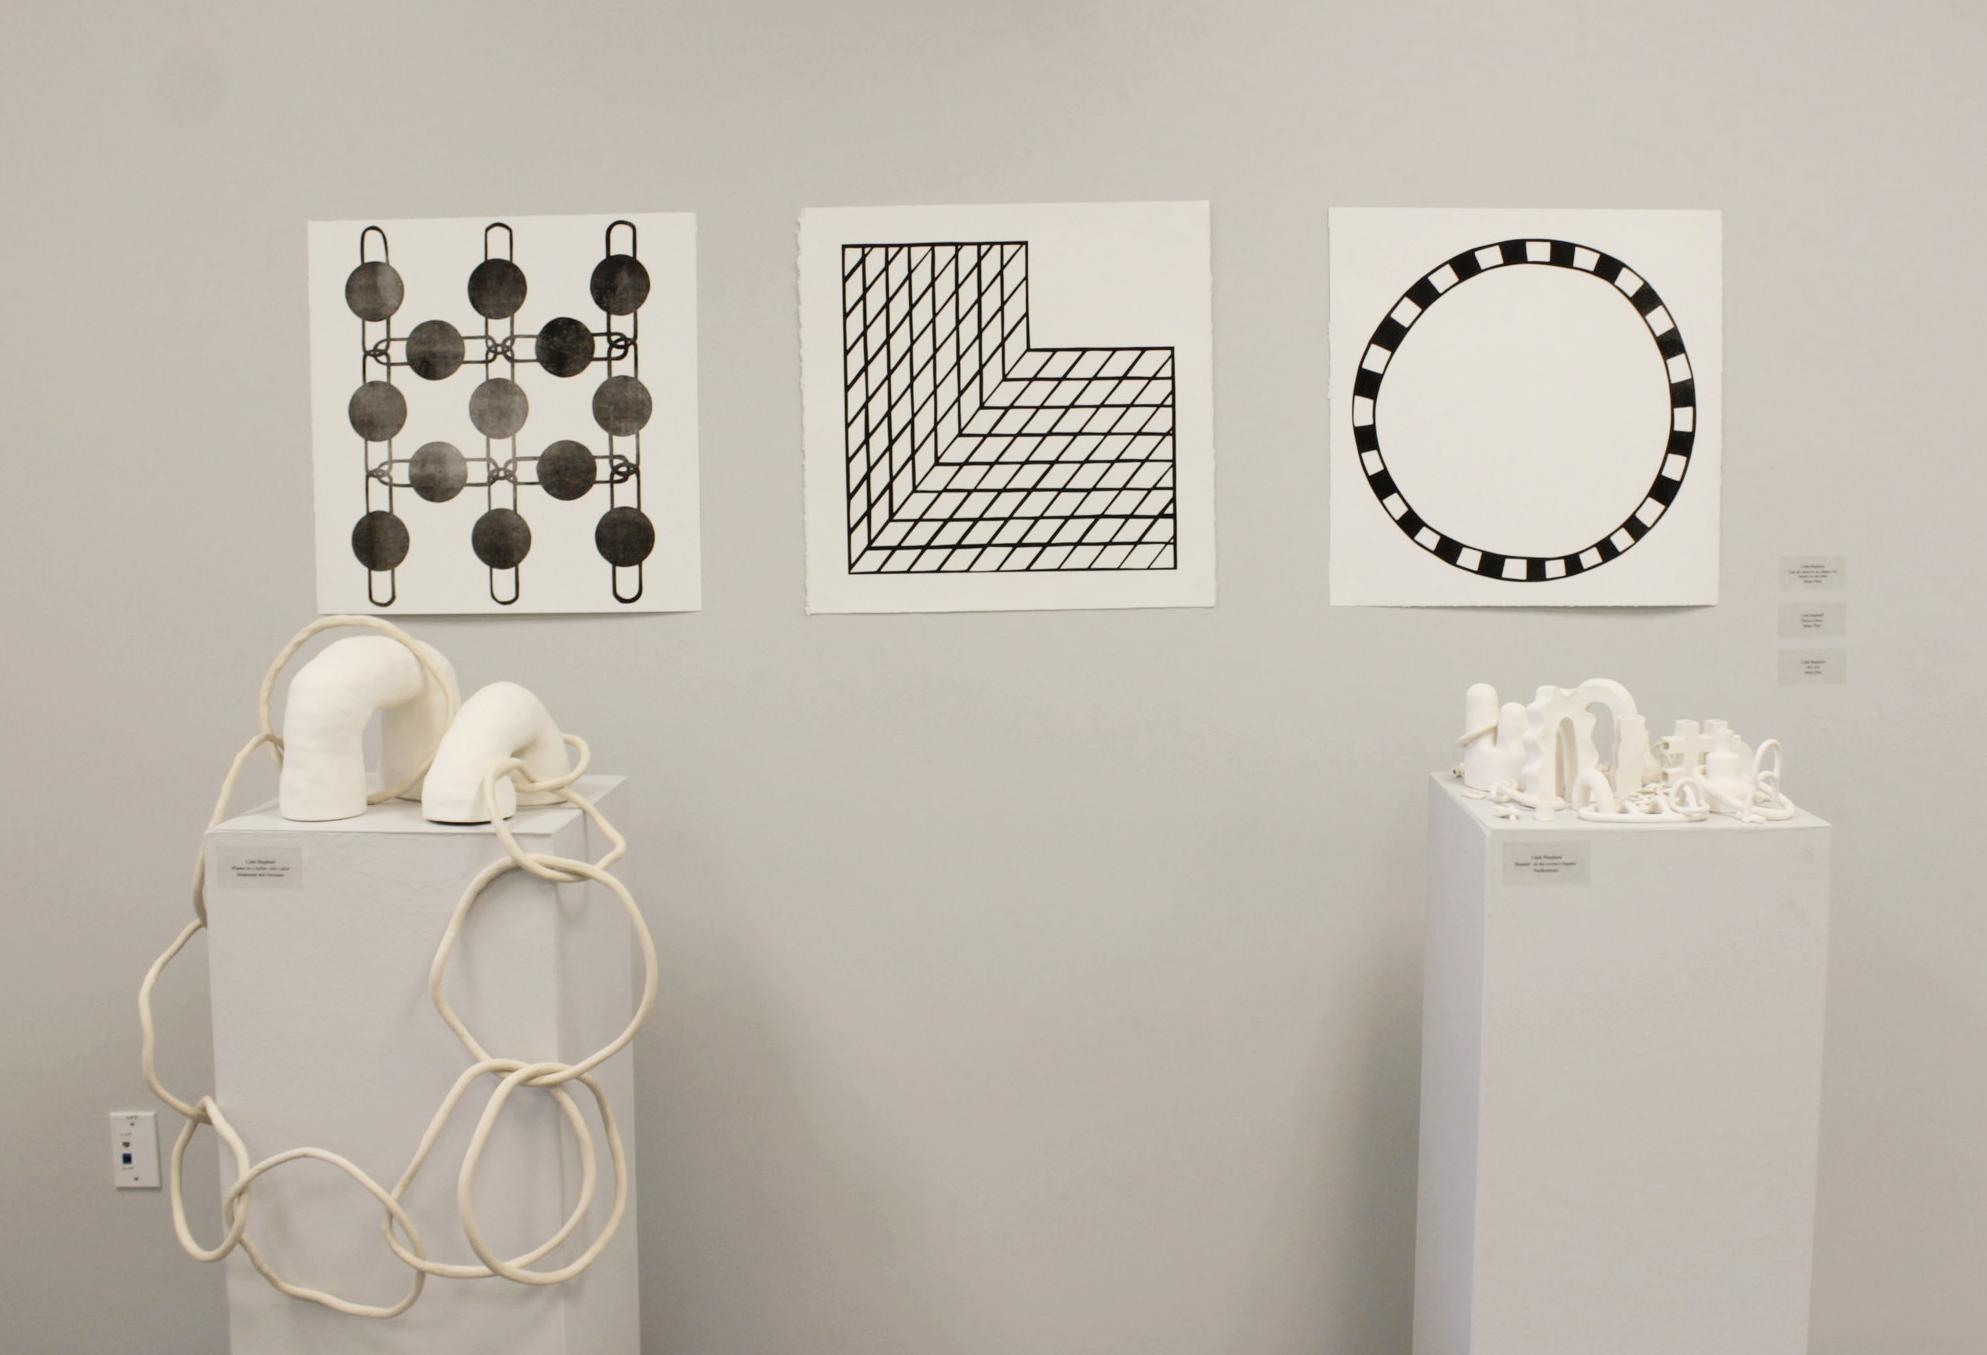 "left to right:  I got my mind on my shapes, my shapes on my mind, m onoprint 22"" x 22""; Physical Ideas, monoprint 22"" x 22""; 90's Kid, monoprint  22"" x 22""  Spring 2017 Selected Works: Current UT Tyler Studio Art Exhibition, UT Tyler, TX"